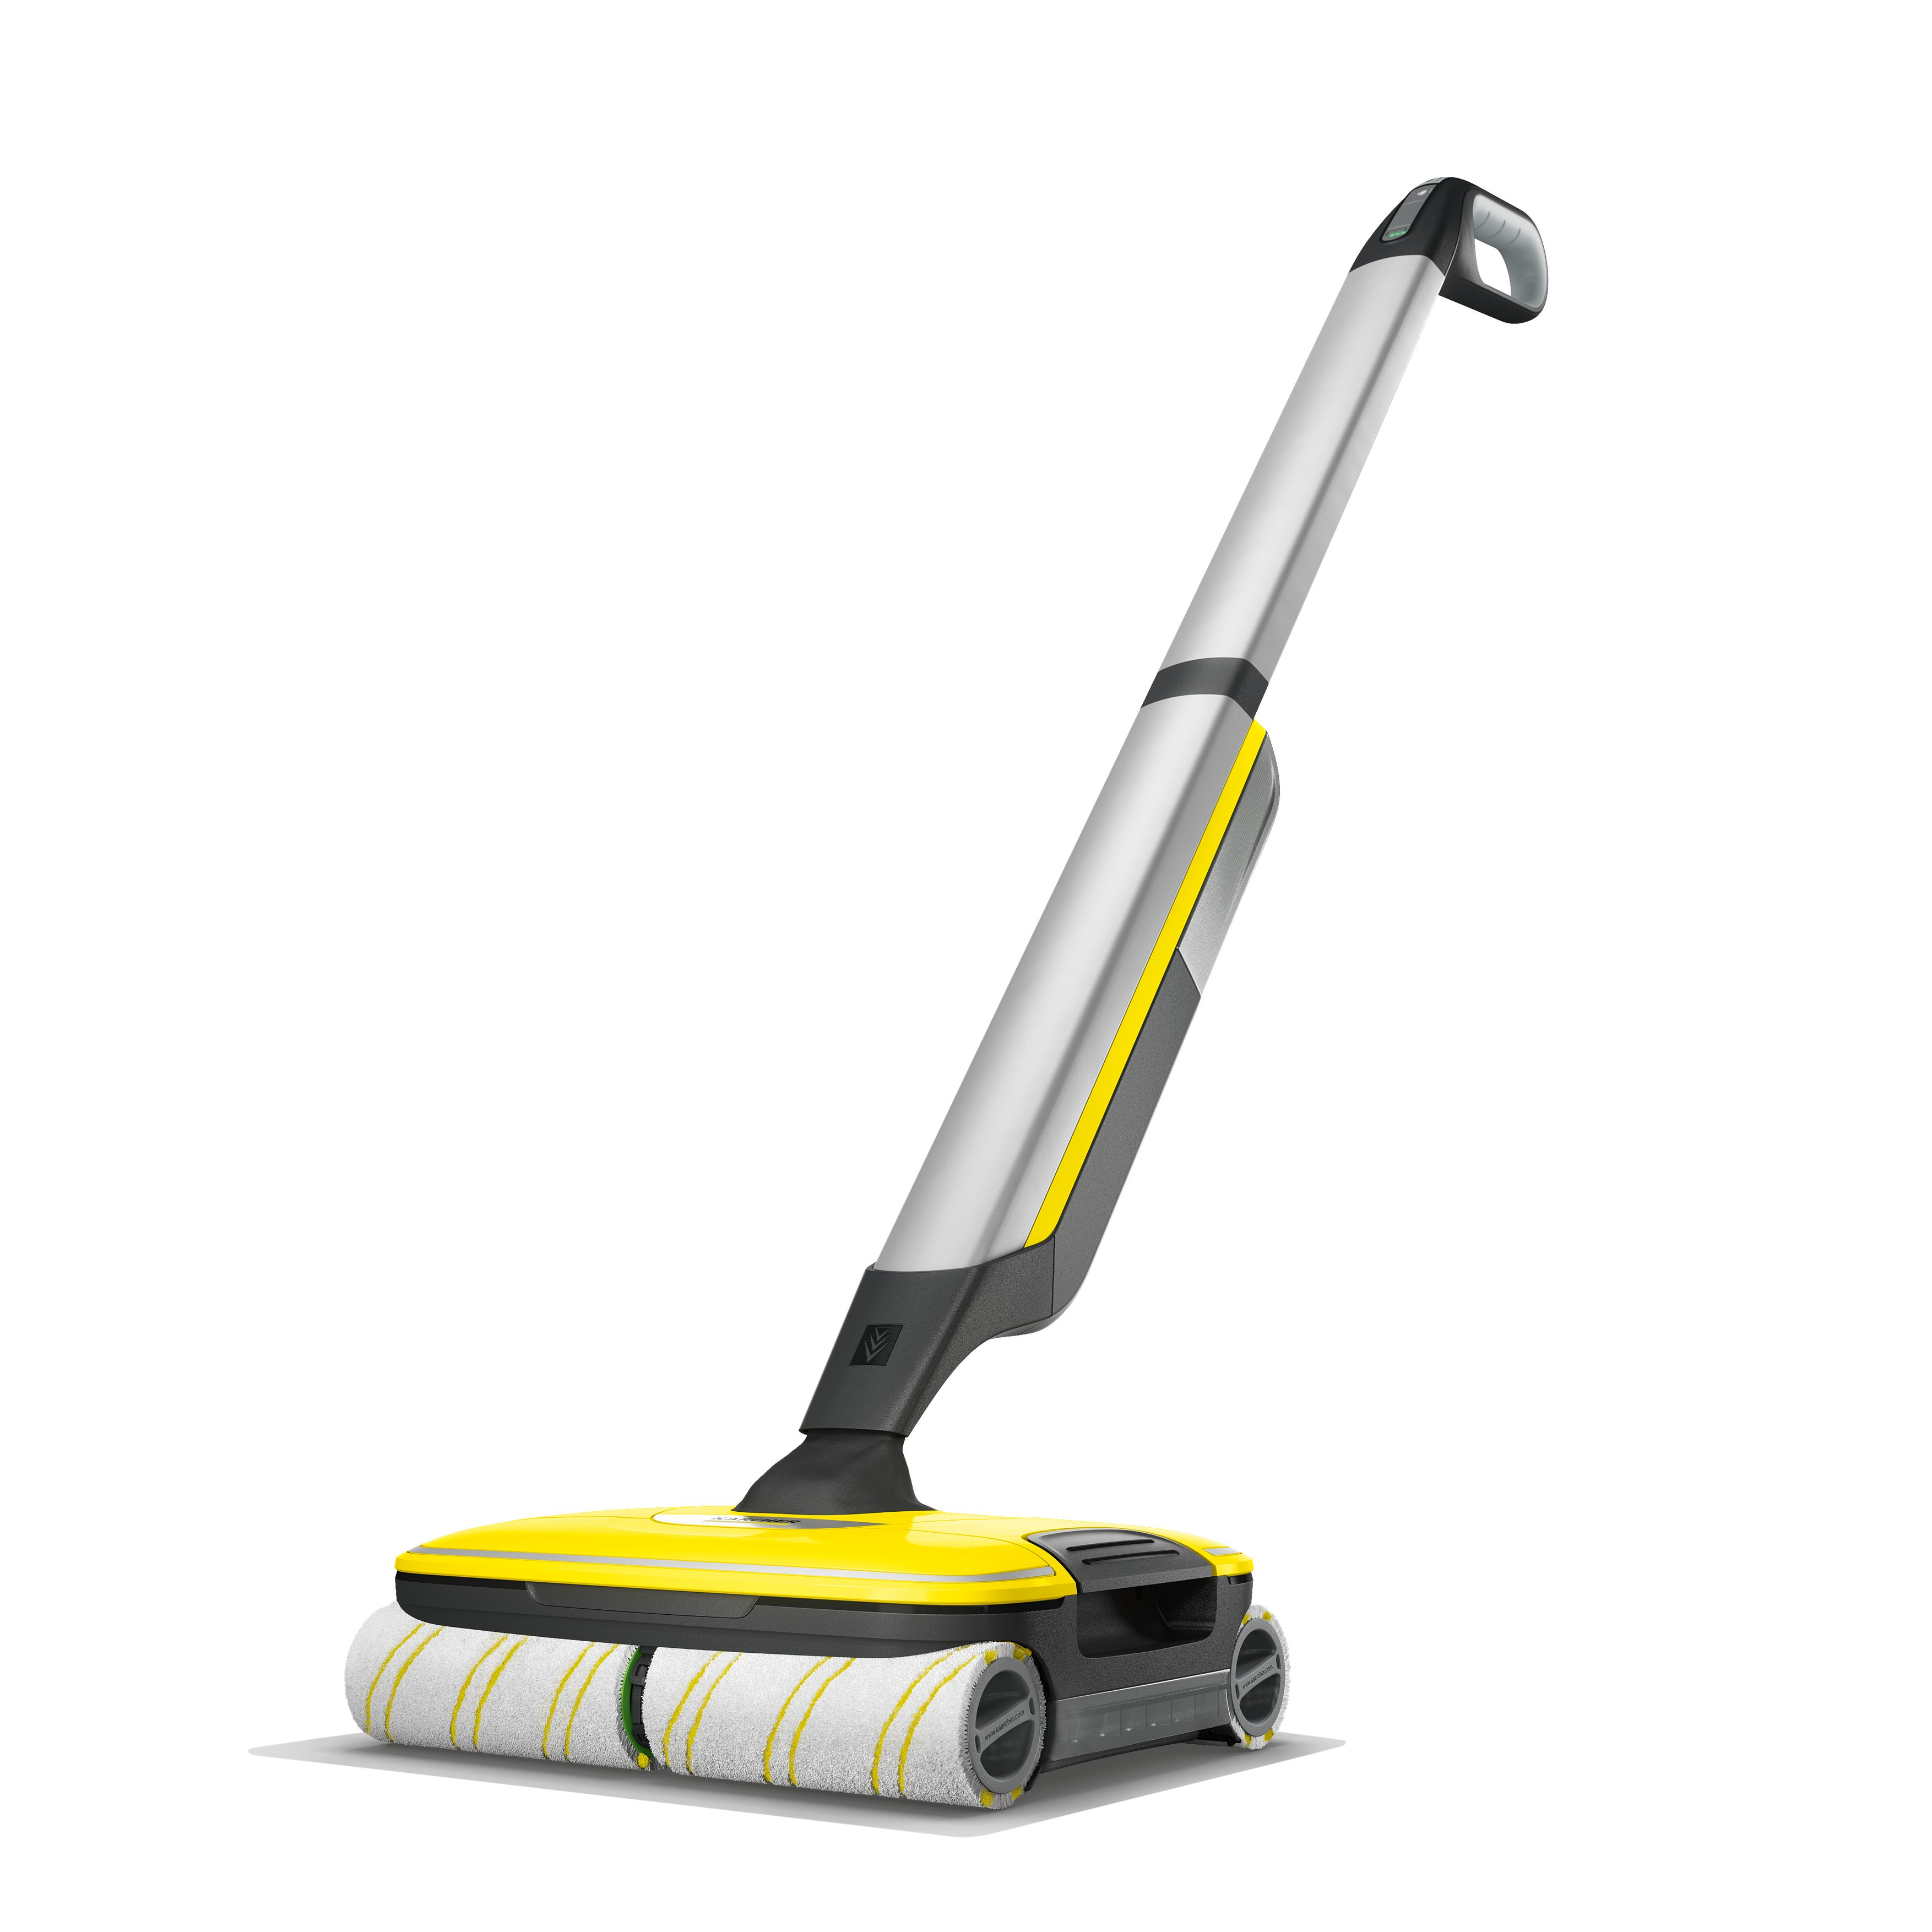 Kärcher - FC 7 Cordless Floor Cleaner